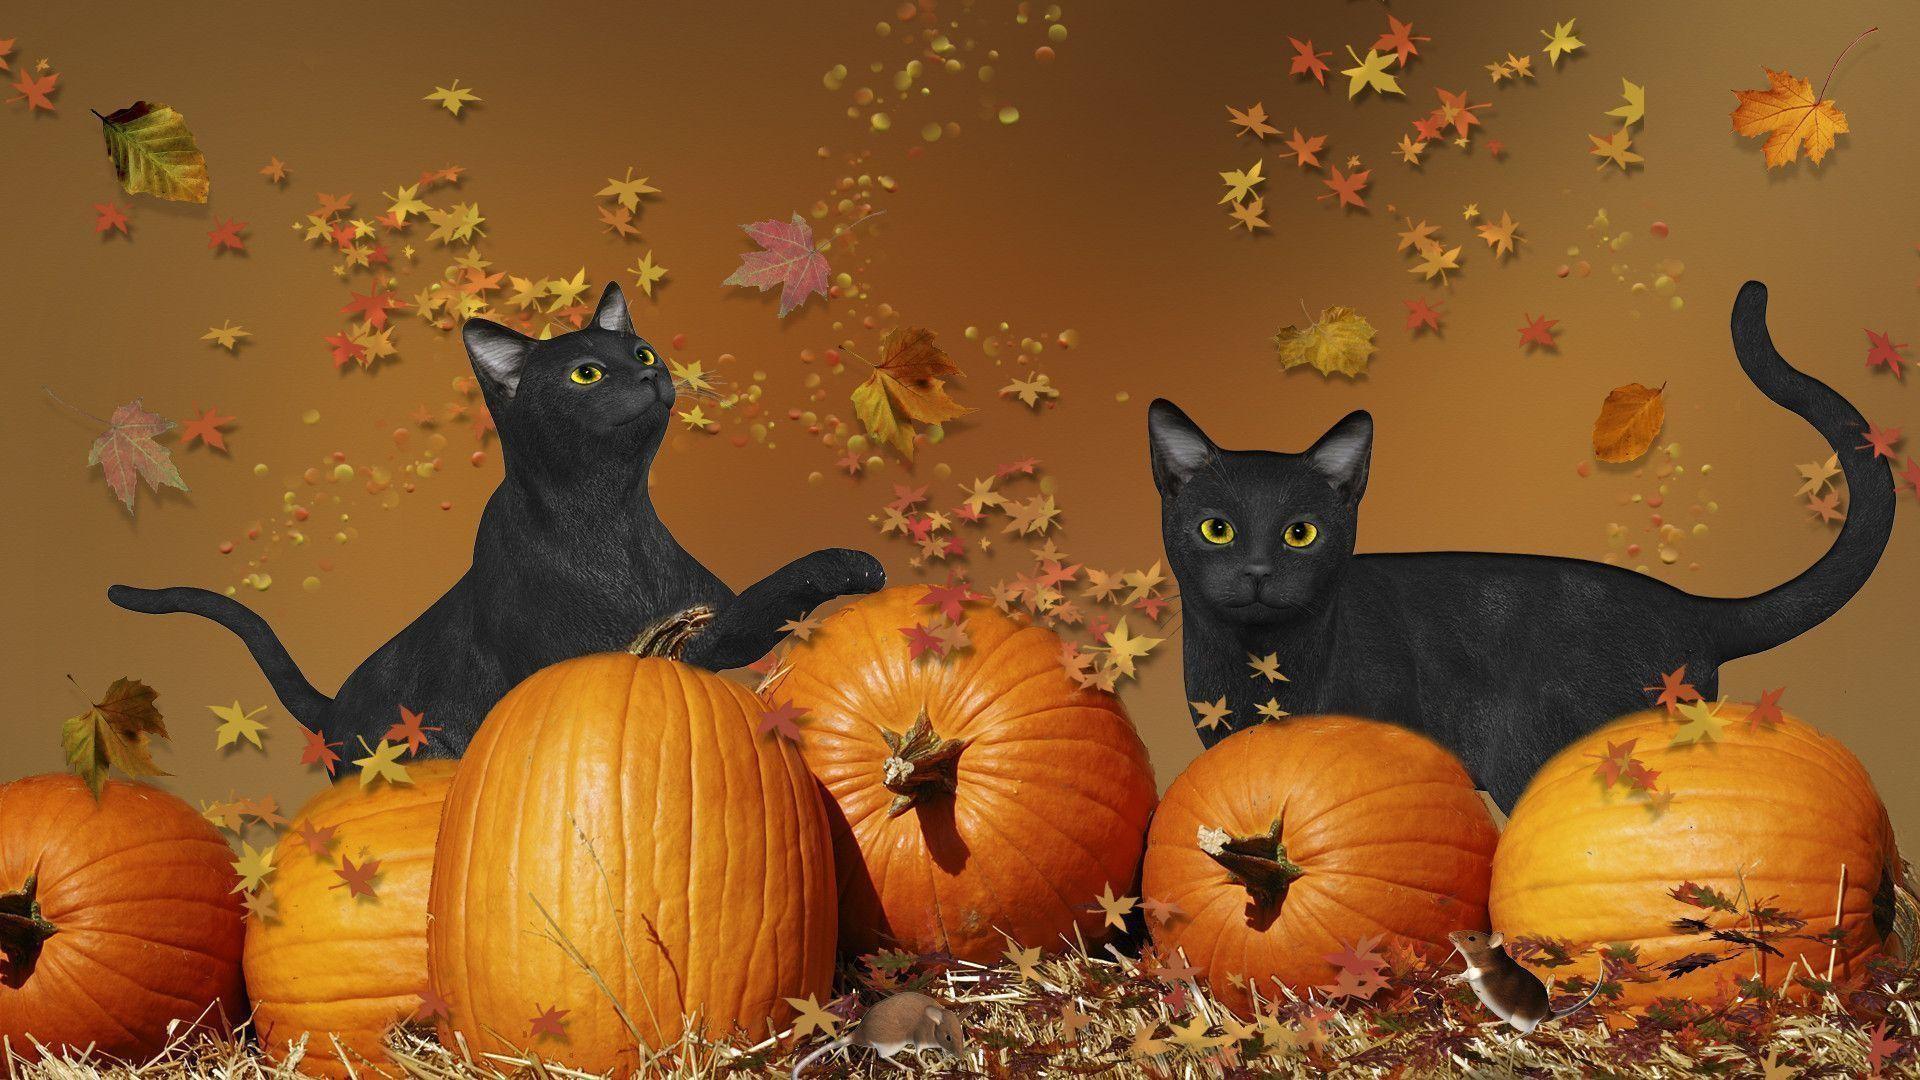 Halloween Black Cat Wallpaper   Cats Wallpaper HD